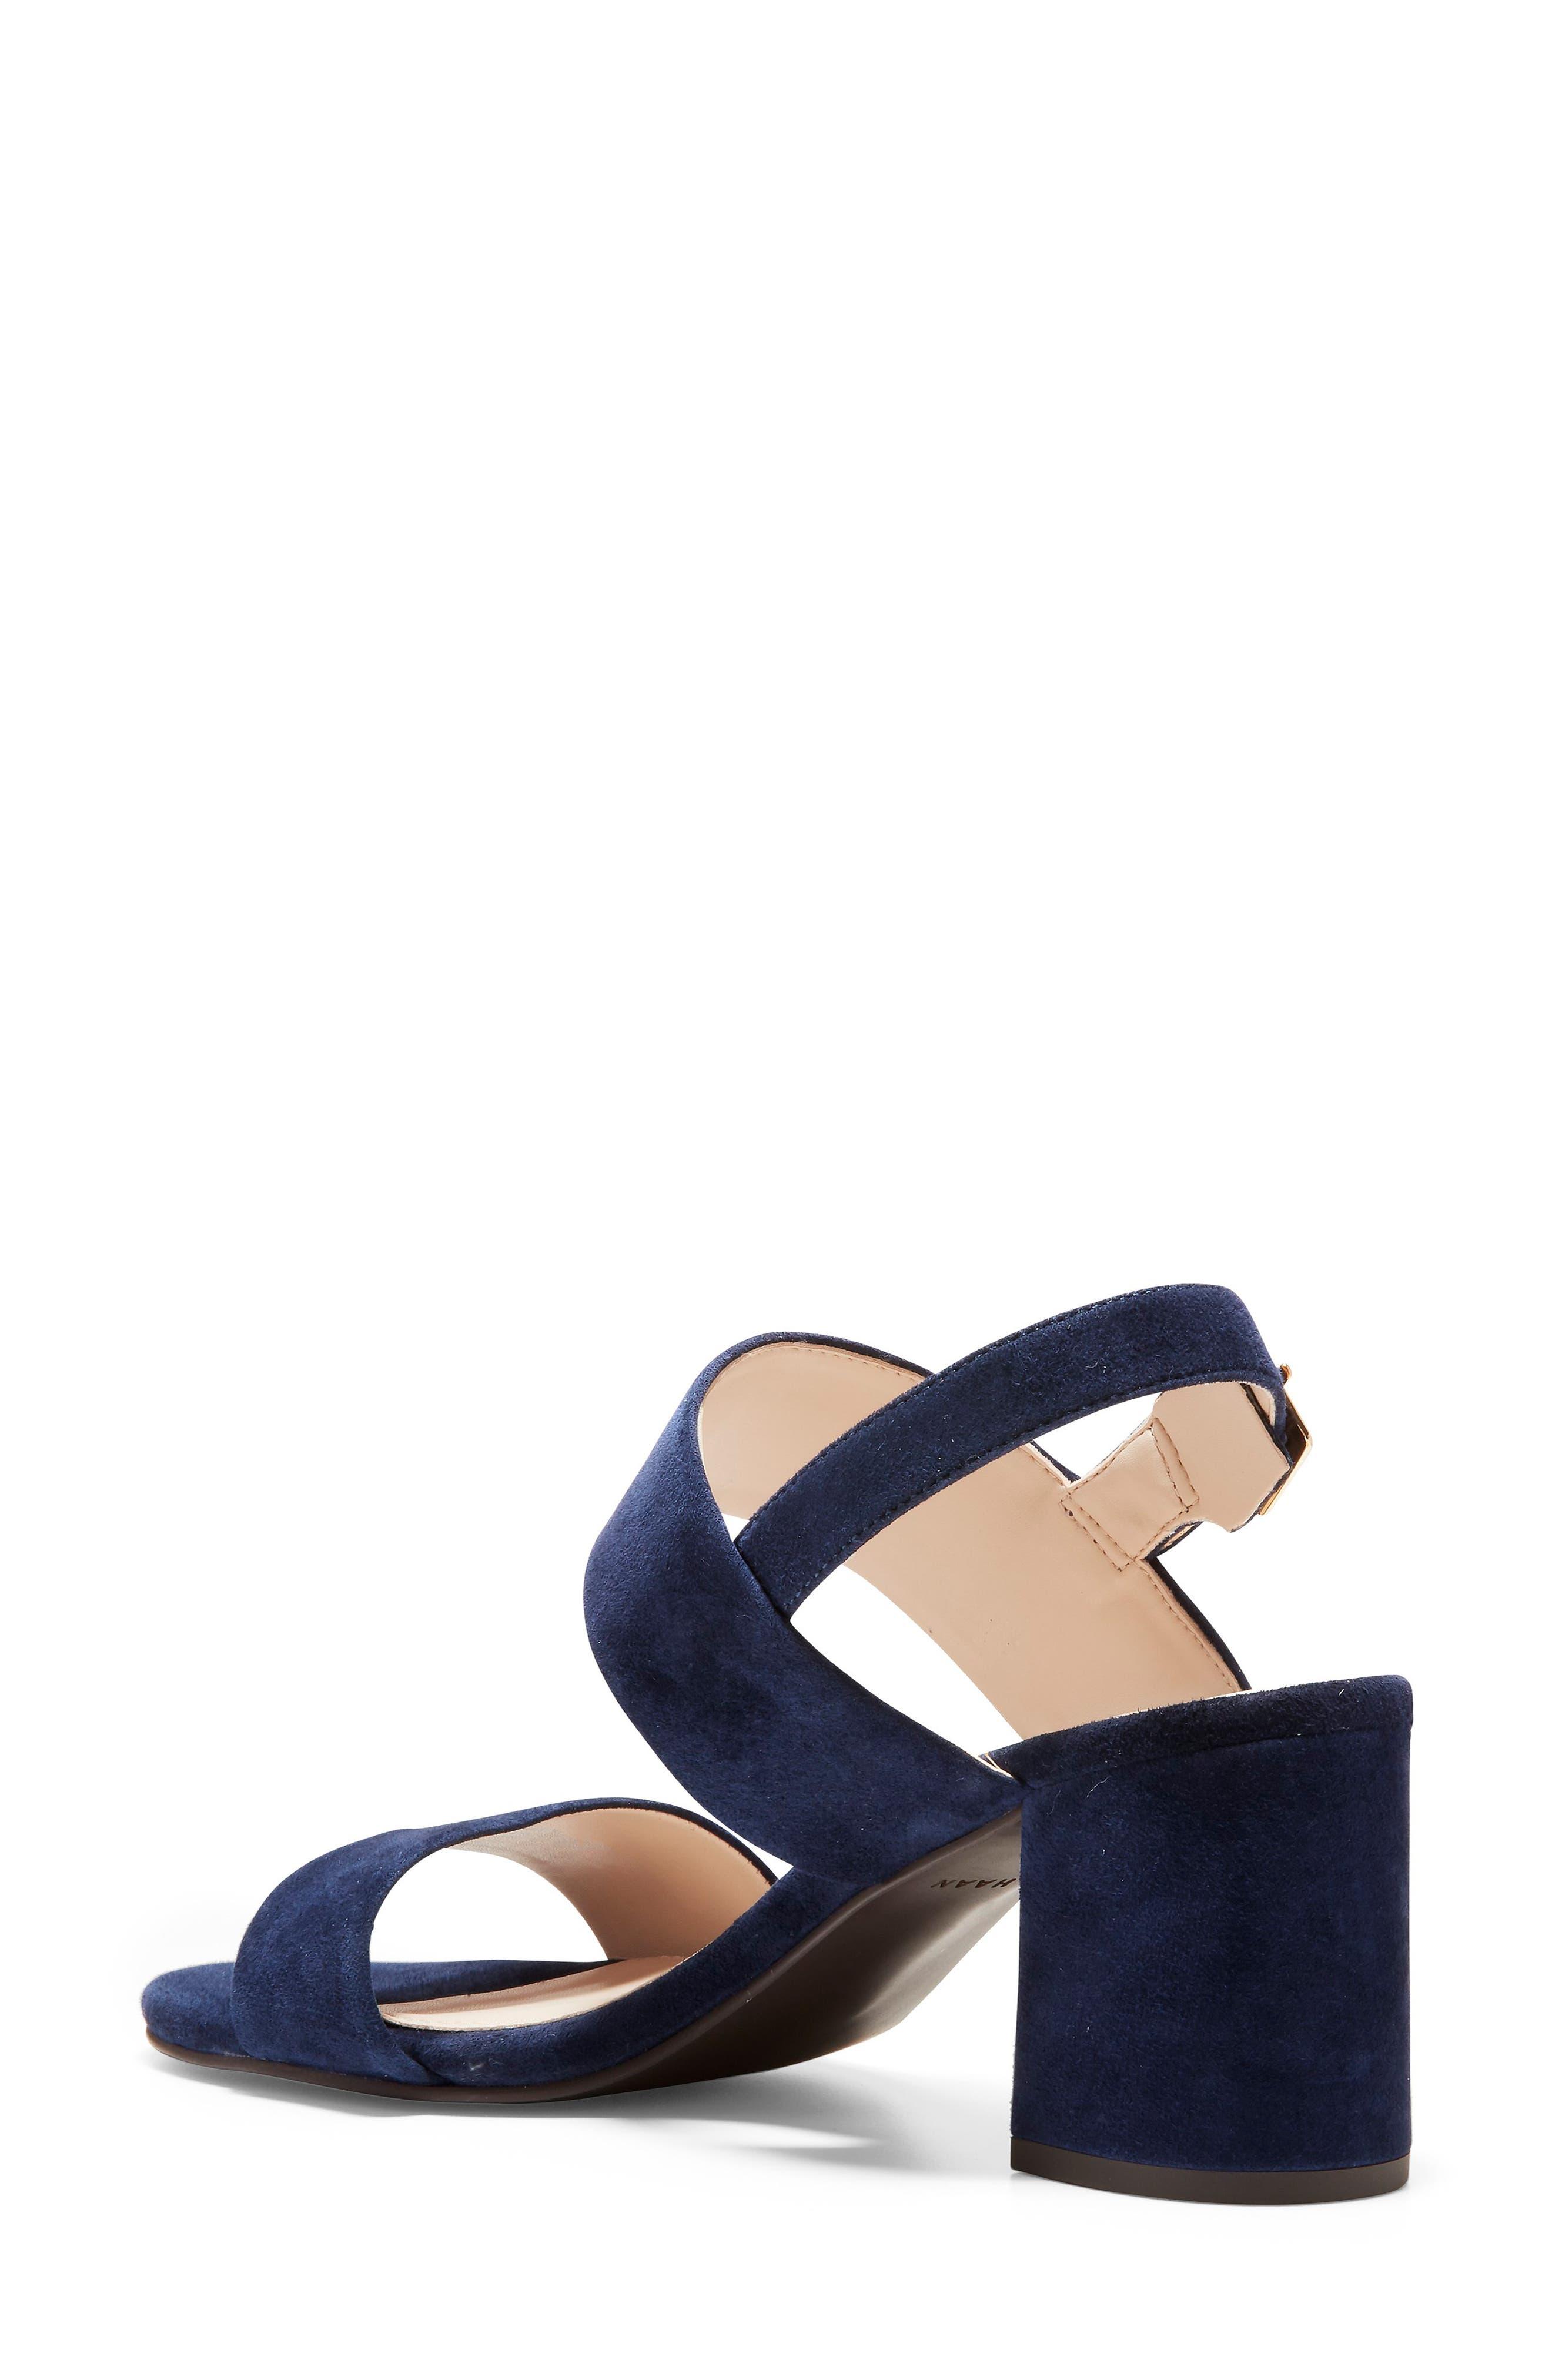 COLE HAAN, Avani Block Heel Sandal, Alternate thumbnail 2, color, MARINE BLUE SUEDE